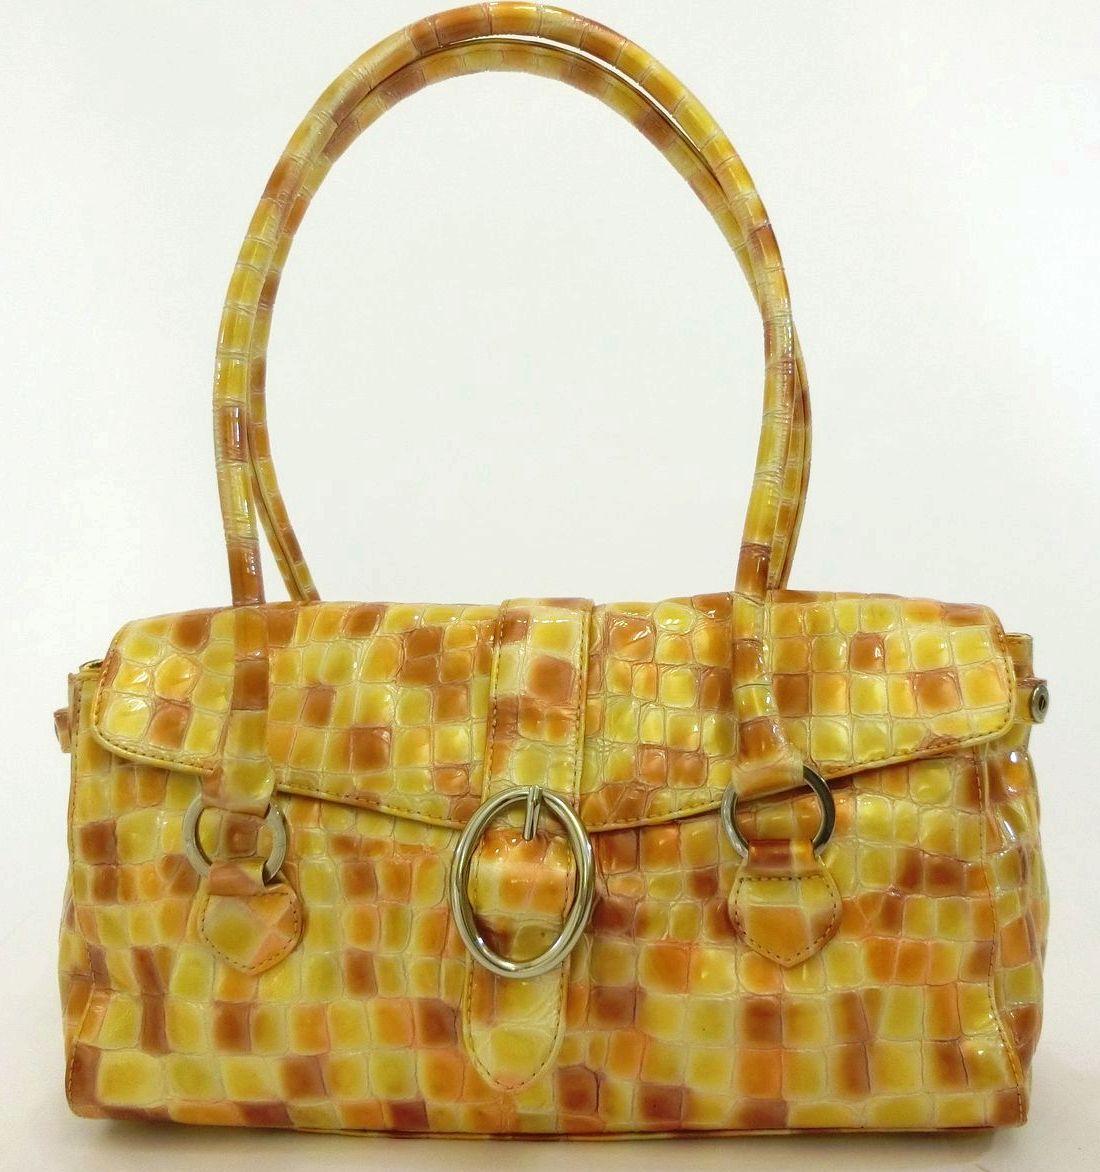 Unused Goods Cocco Fiore Kokofi Ole Original Leather Ko Copel La